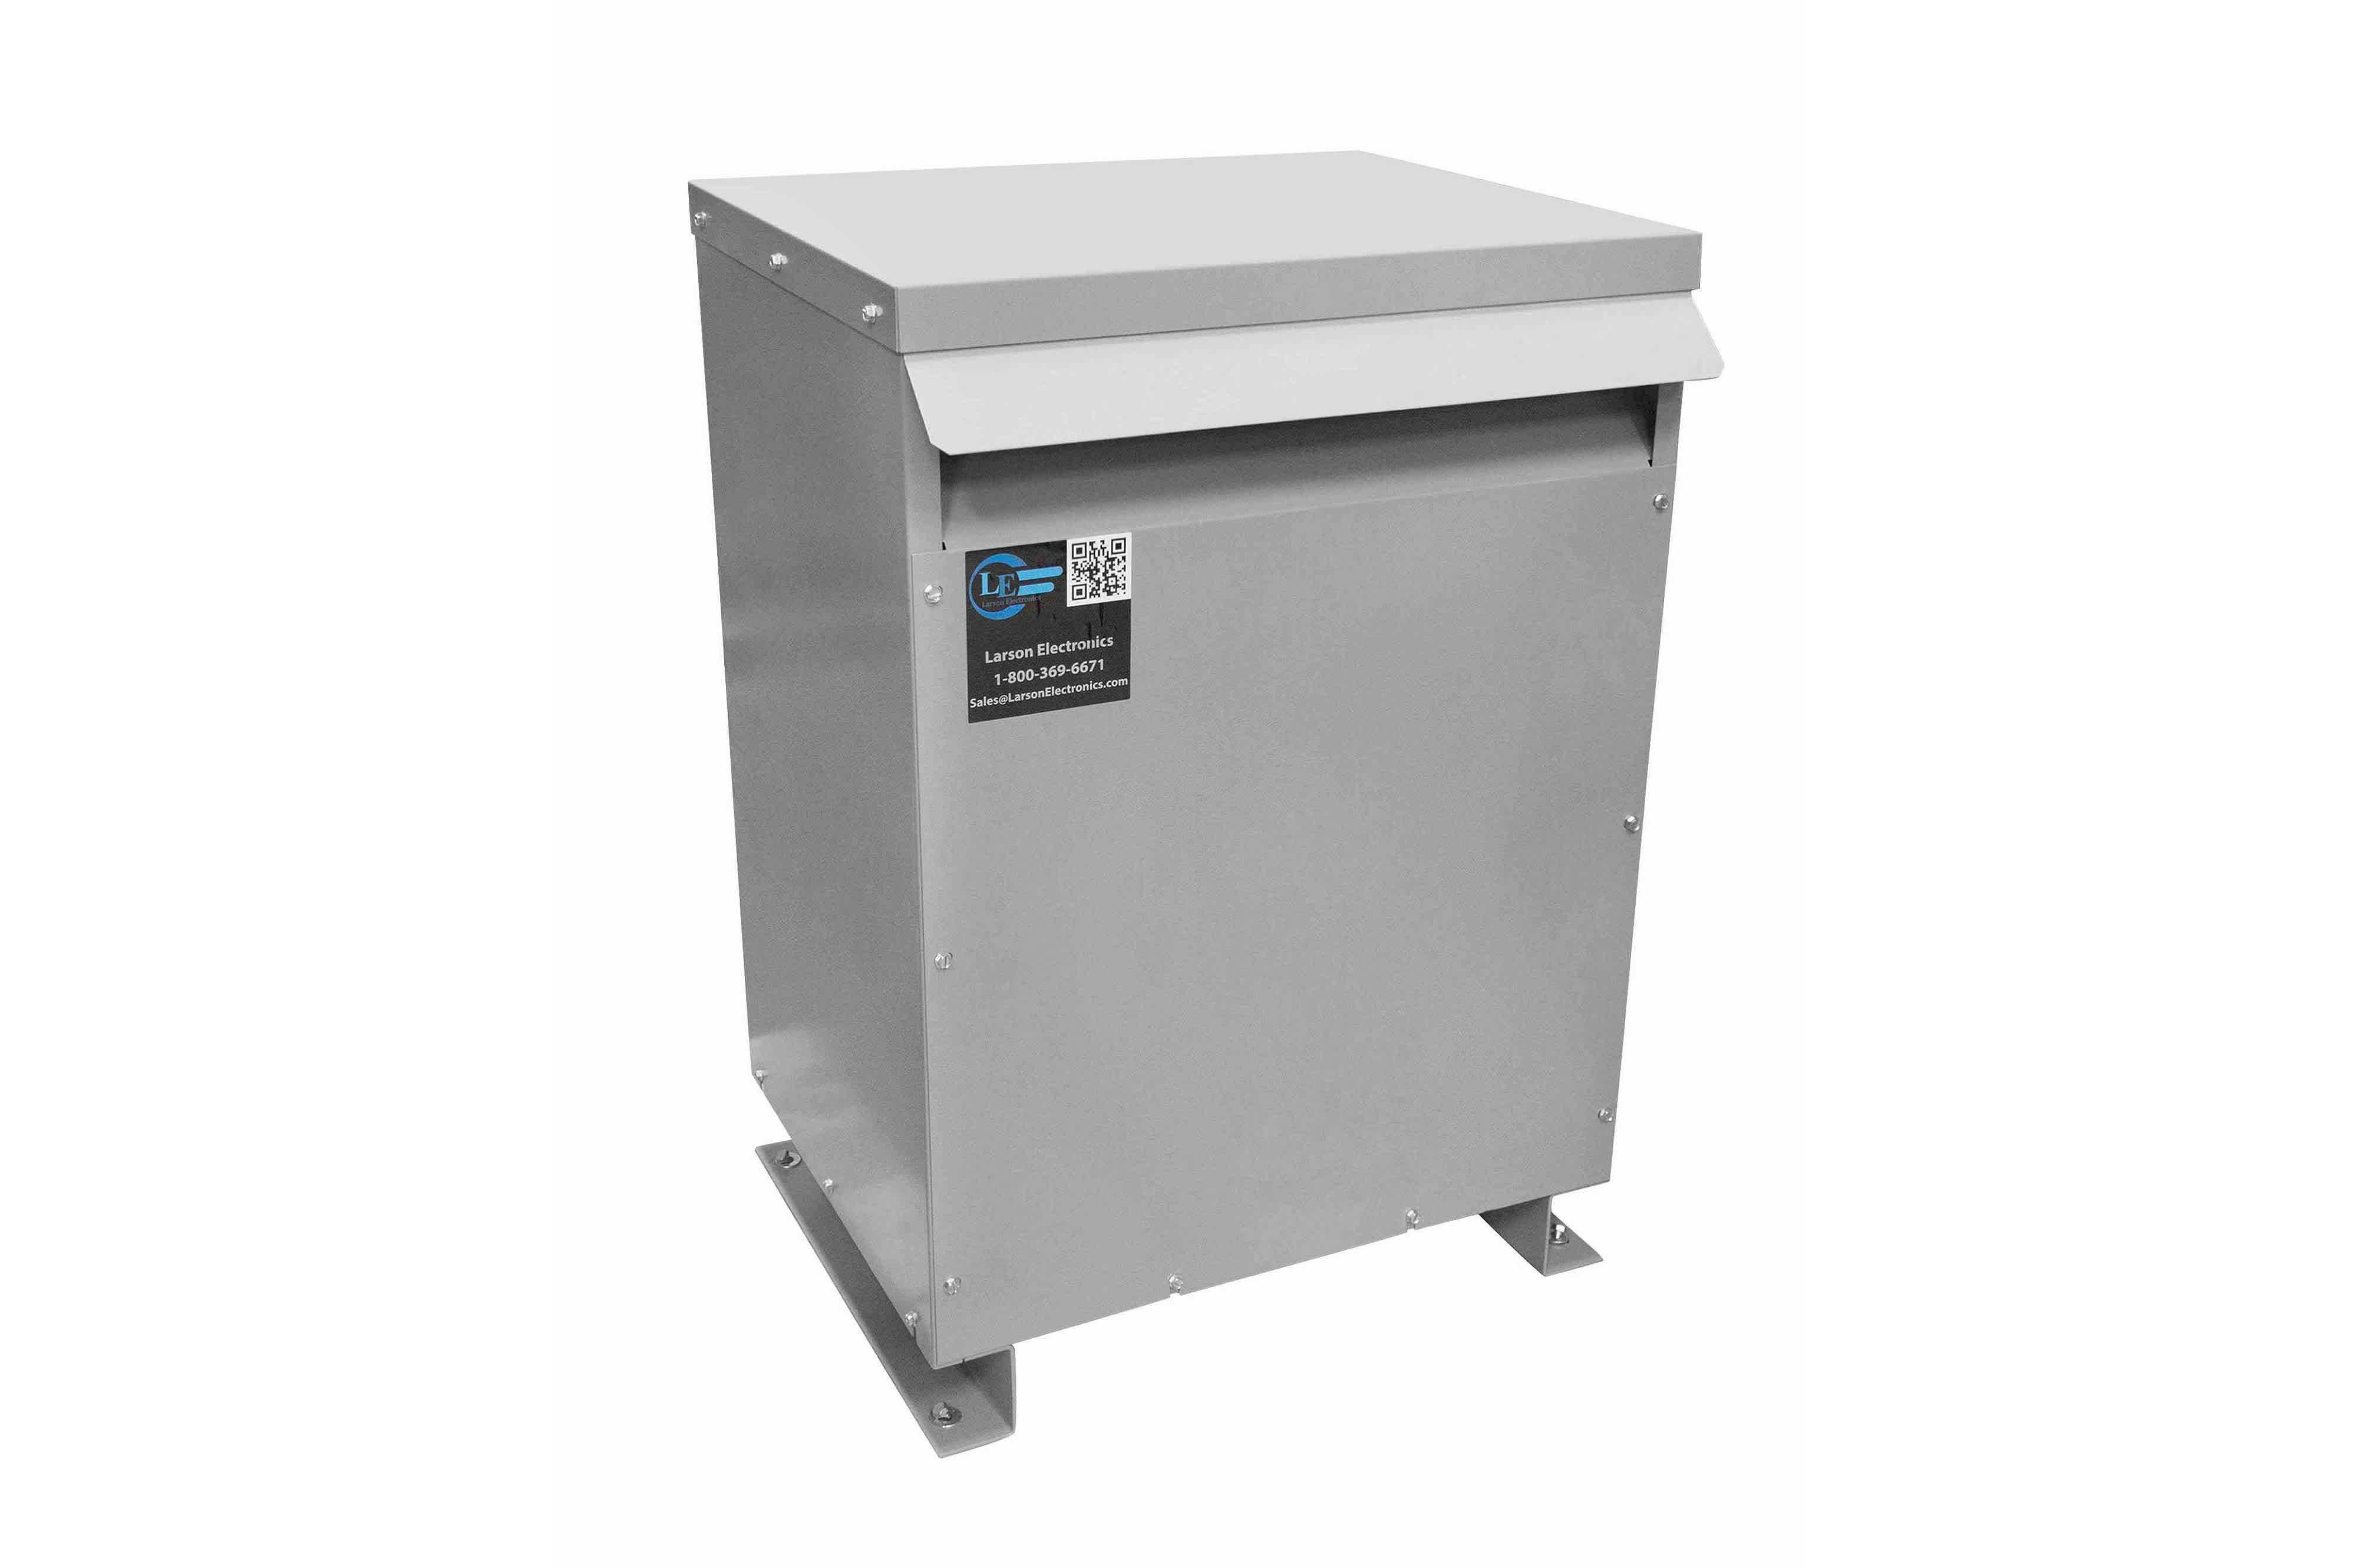 80 kVA 3PH Isolation Transformer, 460V Wye Primary, 400V Delta Secondary, N3R, Ventilated, 60 Hz